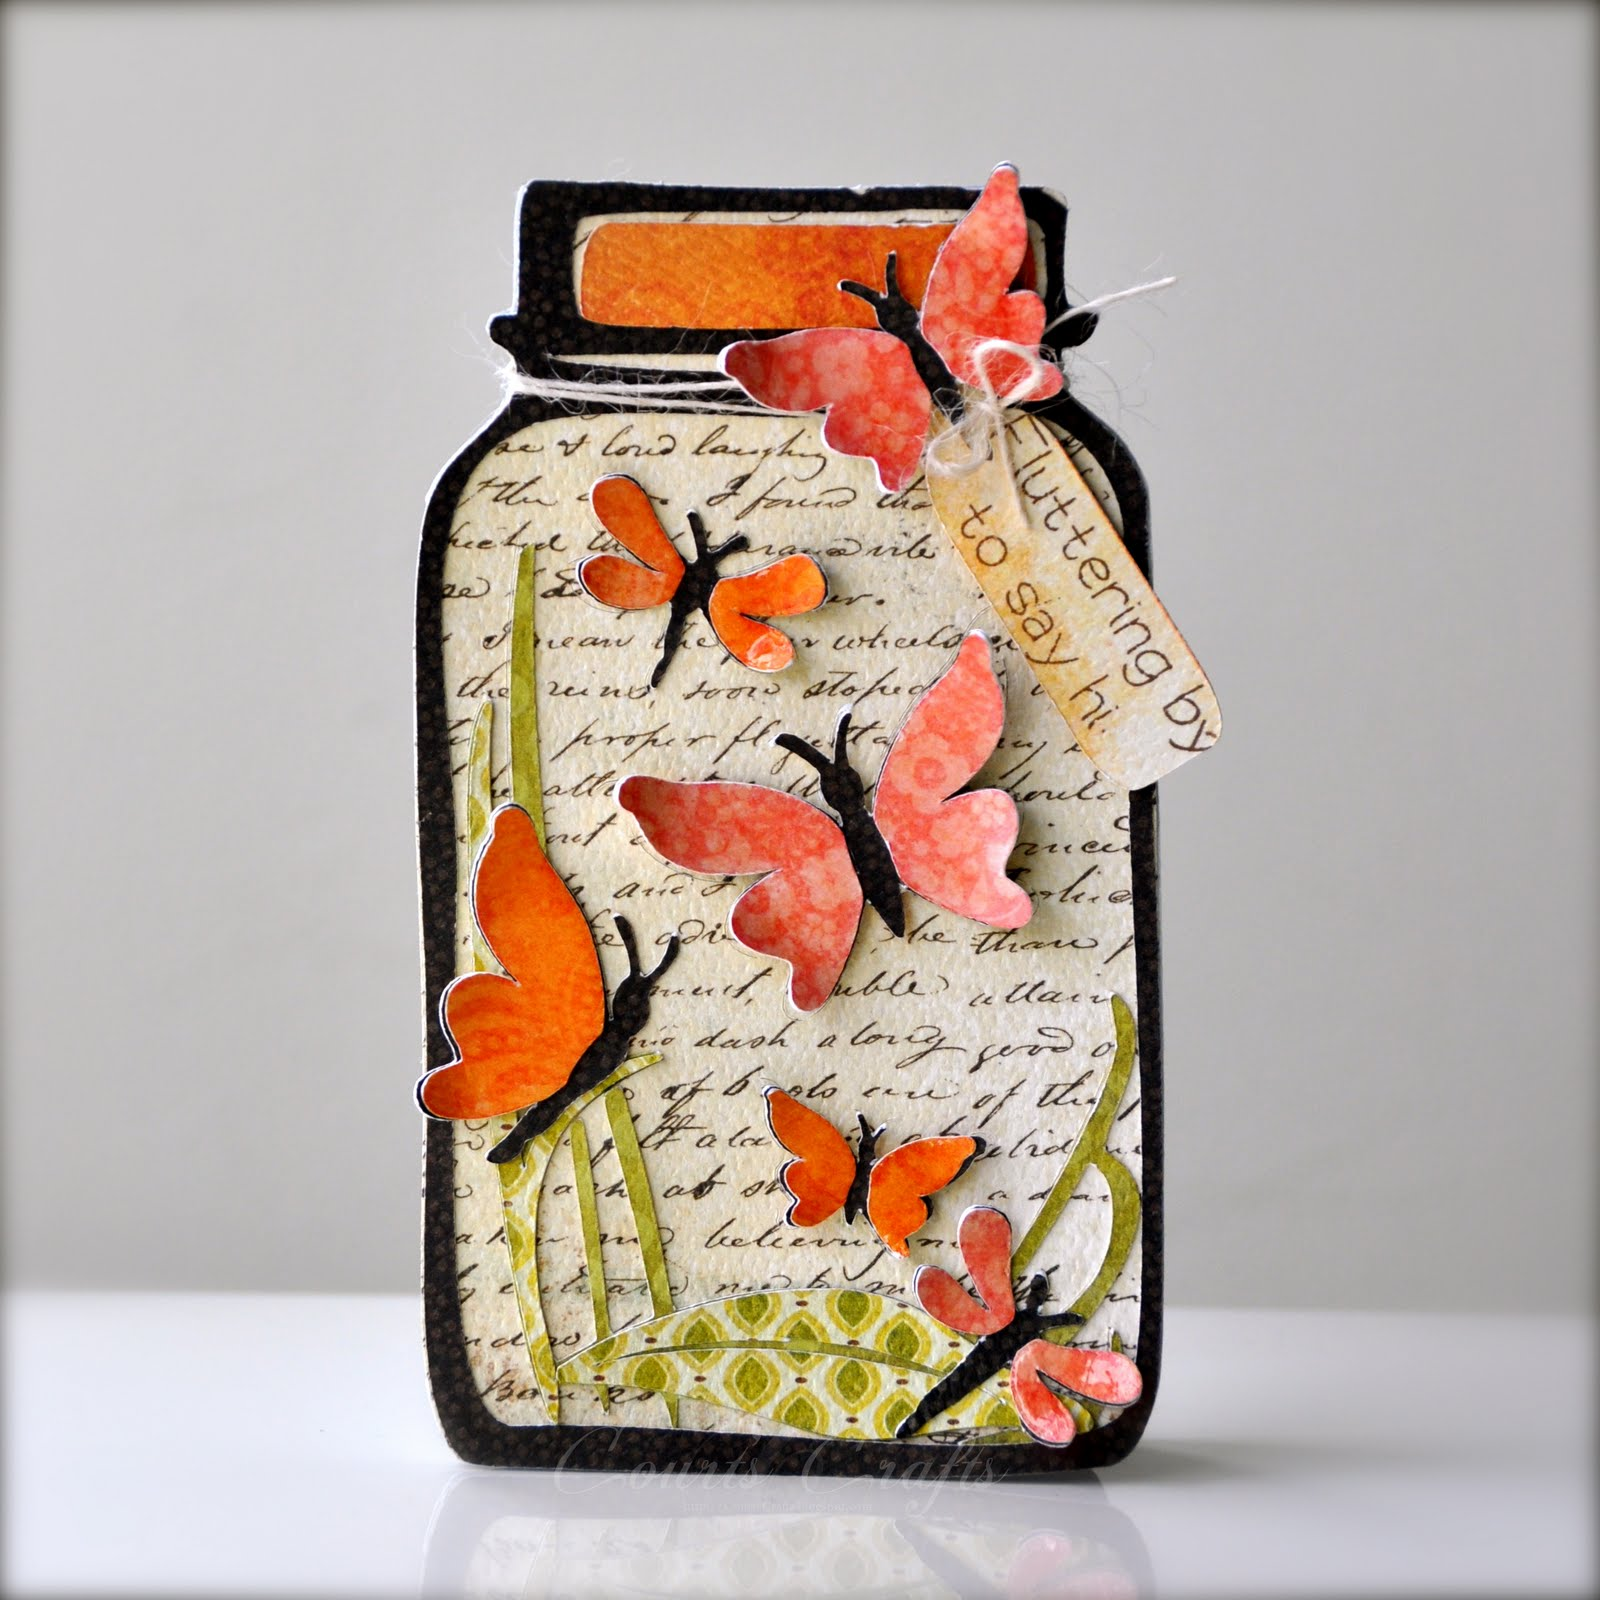 http://2.bp.blogspot.com/-ZviZ7GJhWnc/TiOL7sszhCI/AAAAAAAAByI/G_ow46pcBWs/s1600/FlutteringByToSayHi-Jar.jpg